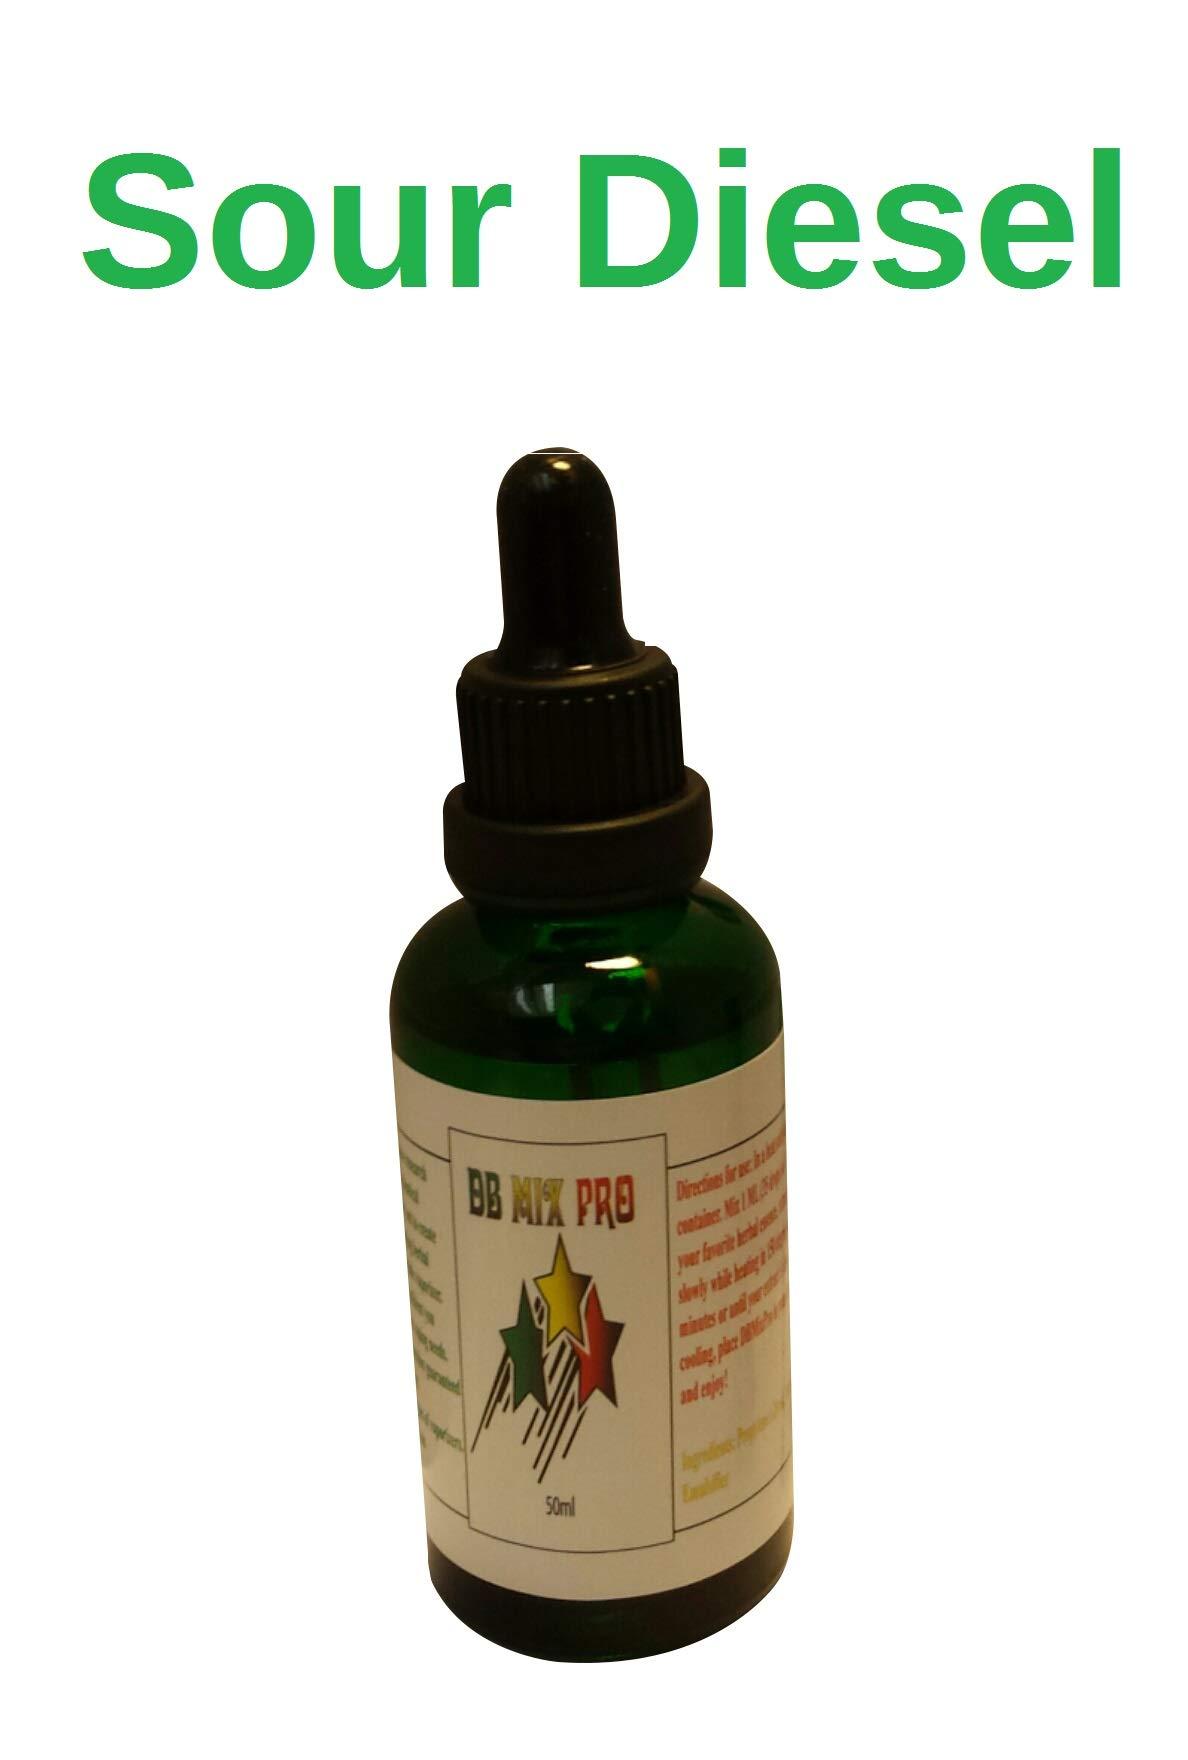 Sour Diesel Terpene Infused Liquidizer 50ml 99% Pure Colorado Terpenes